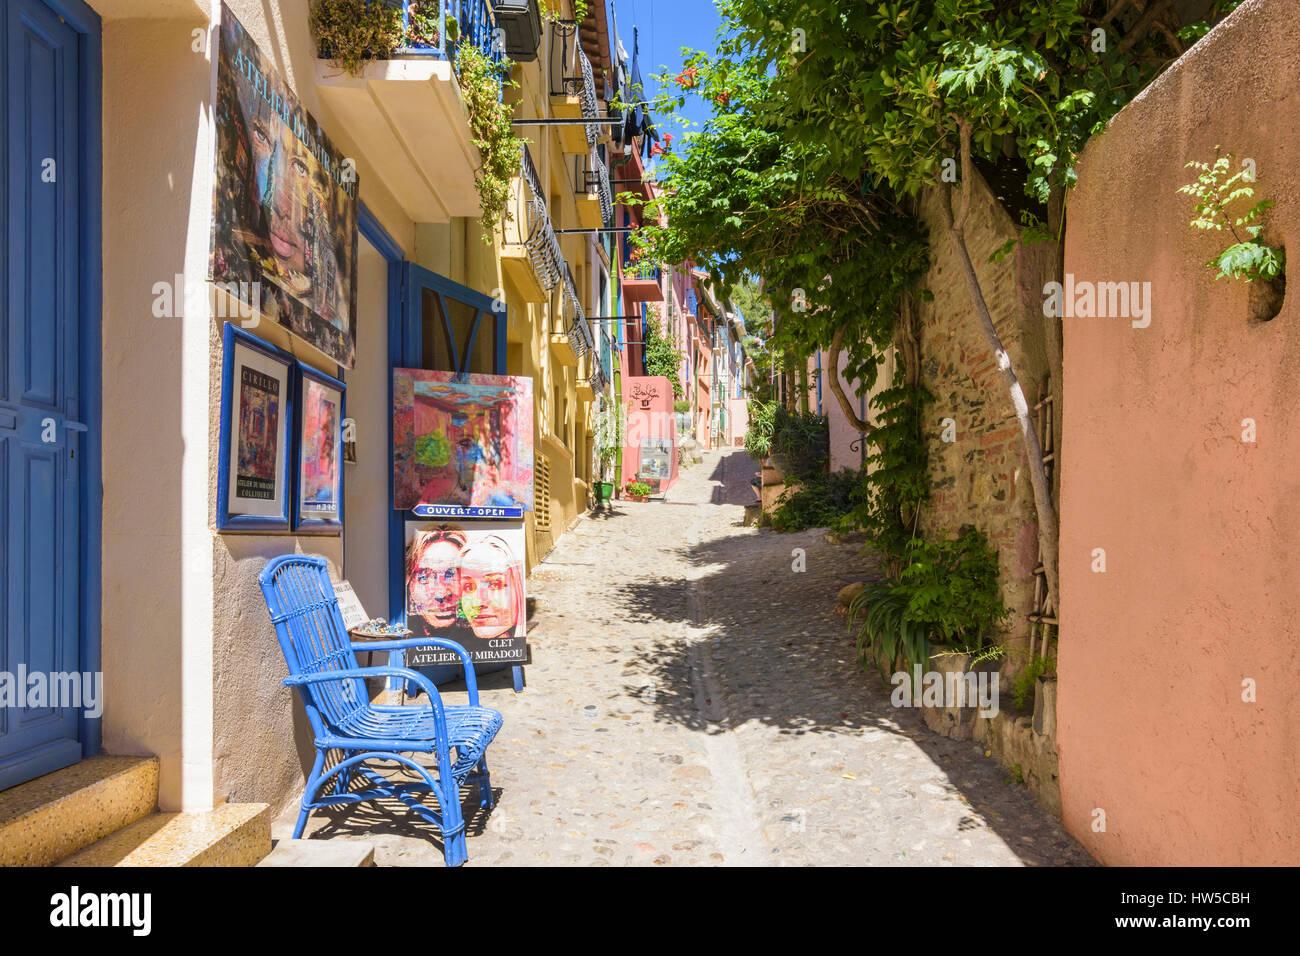 Artist studio in the old quartier Mouré in Collioure town, Côte Vermeille, France - Stock Image